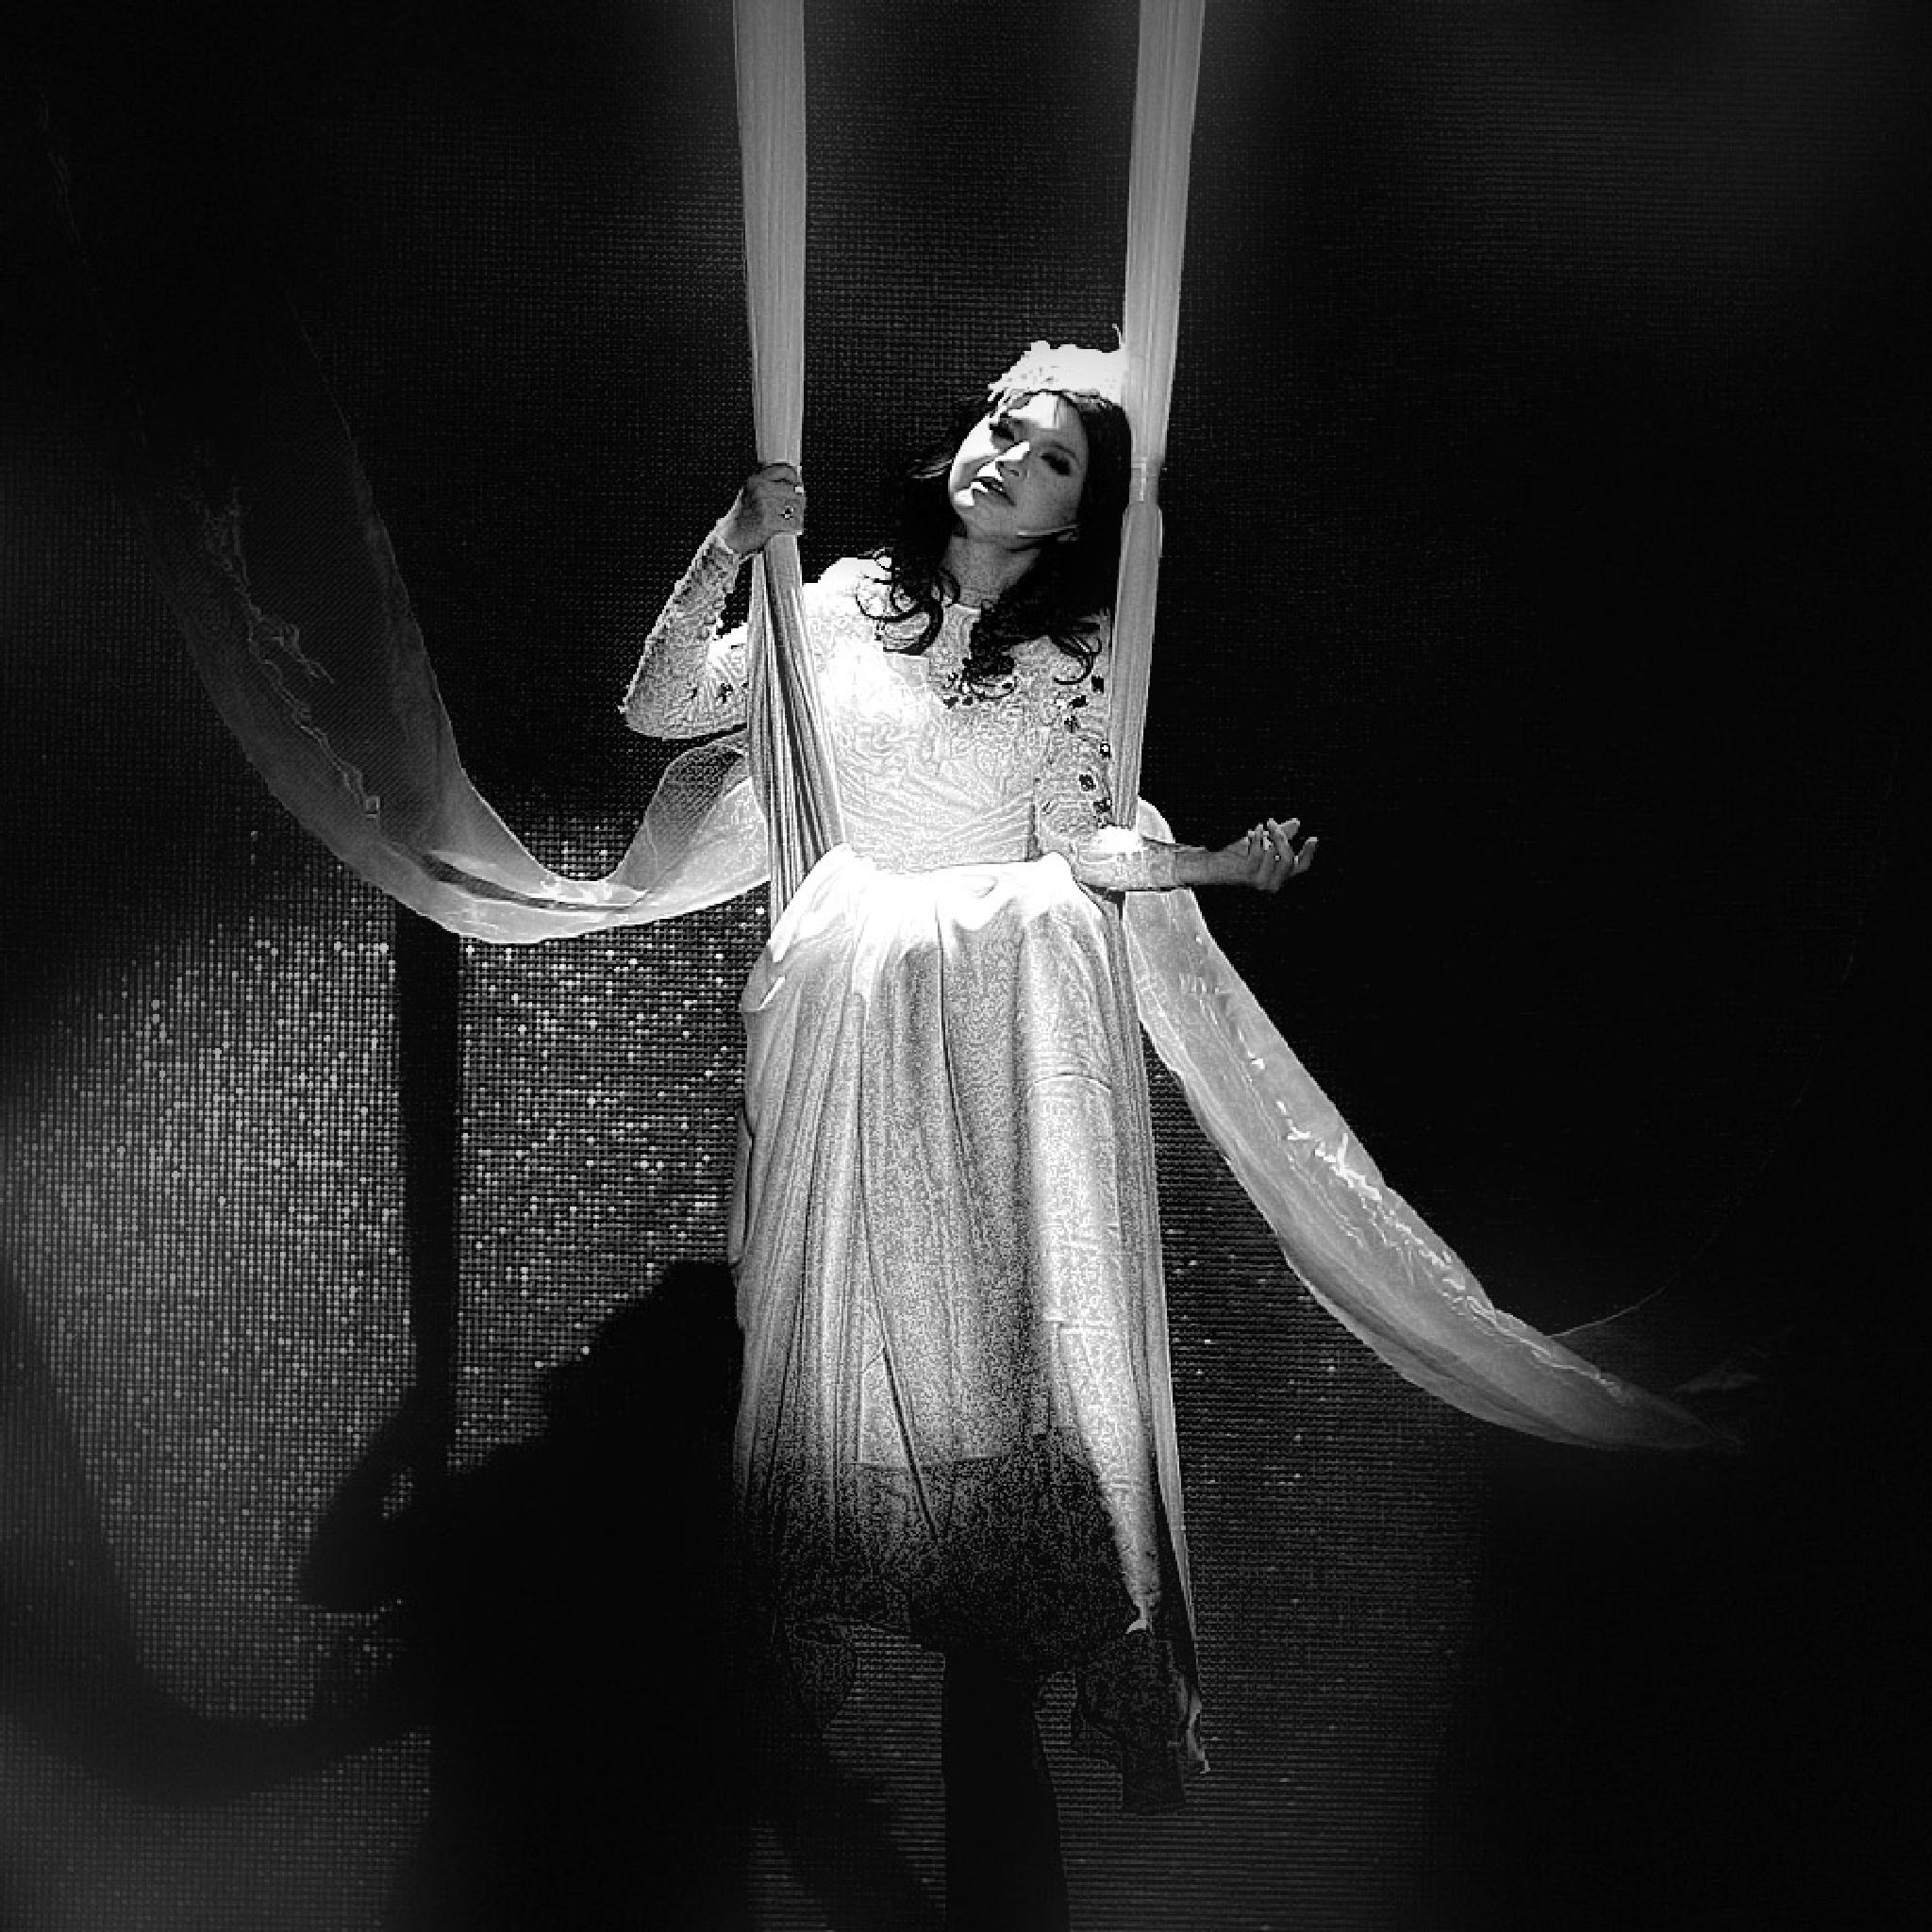 swinging by dianmao